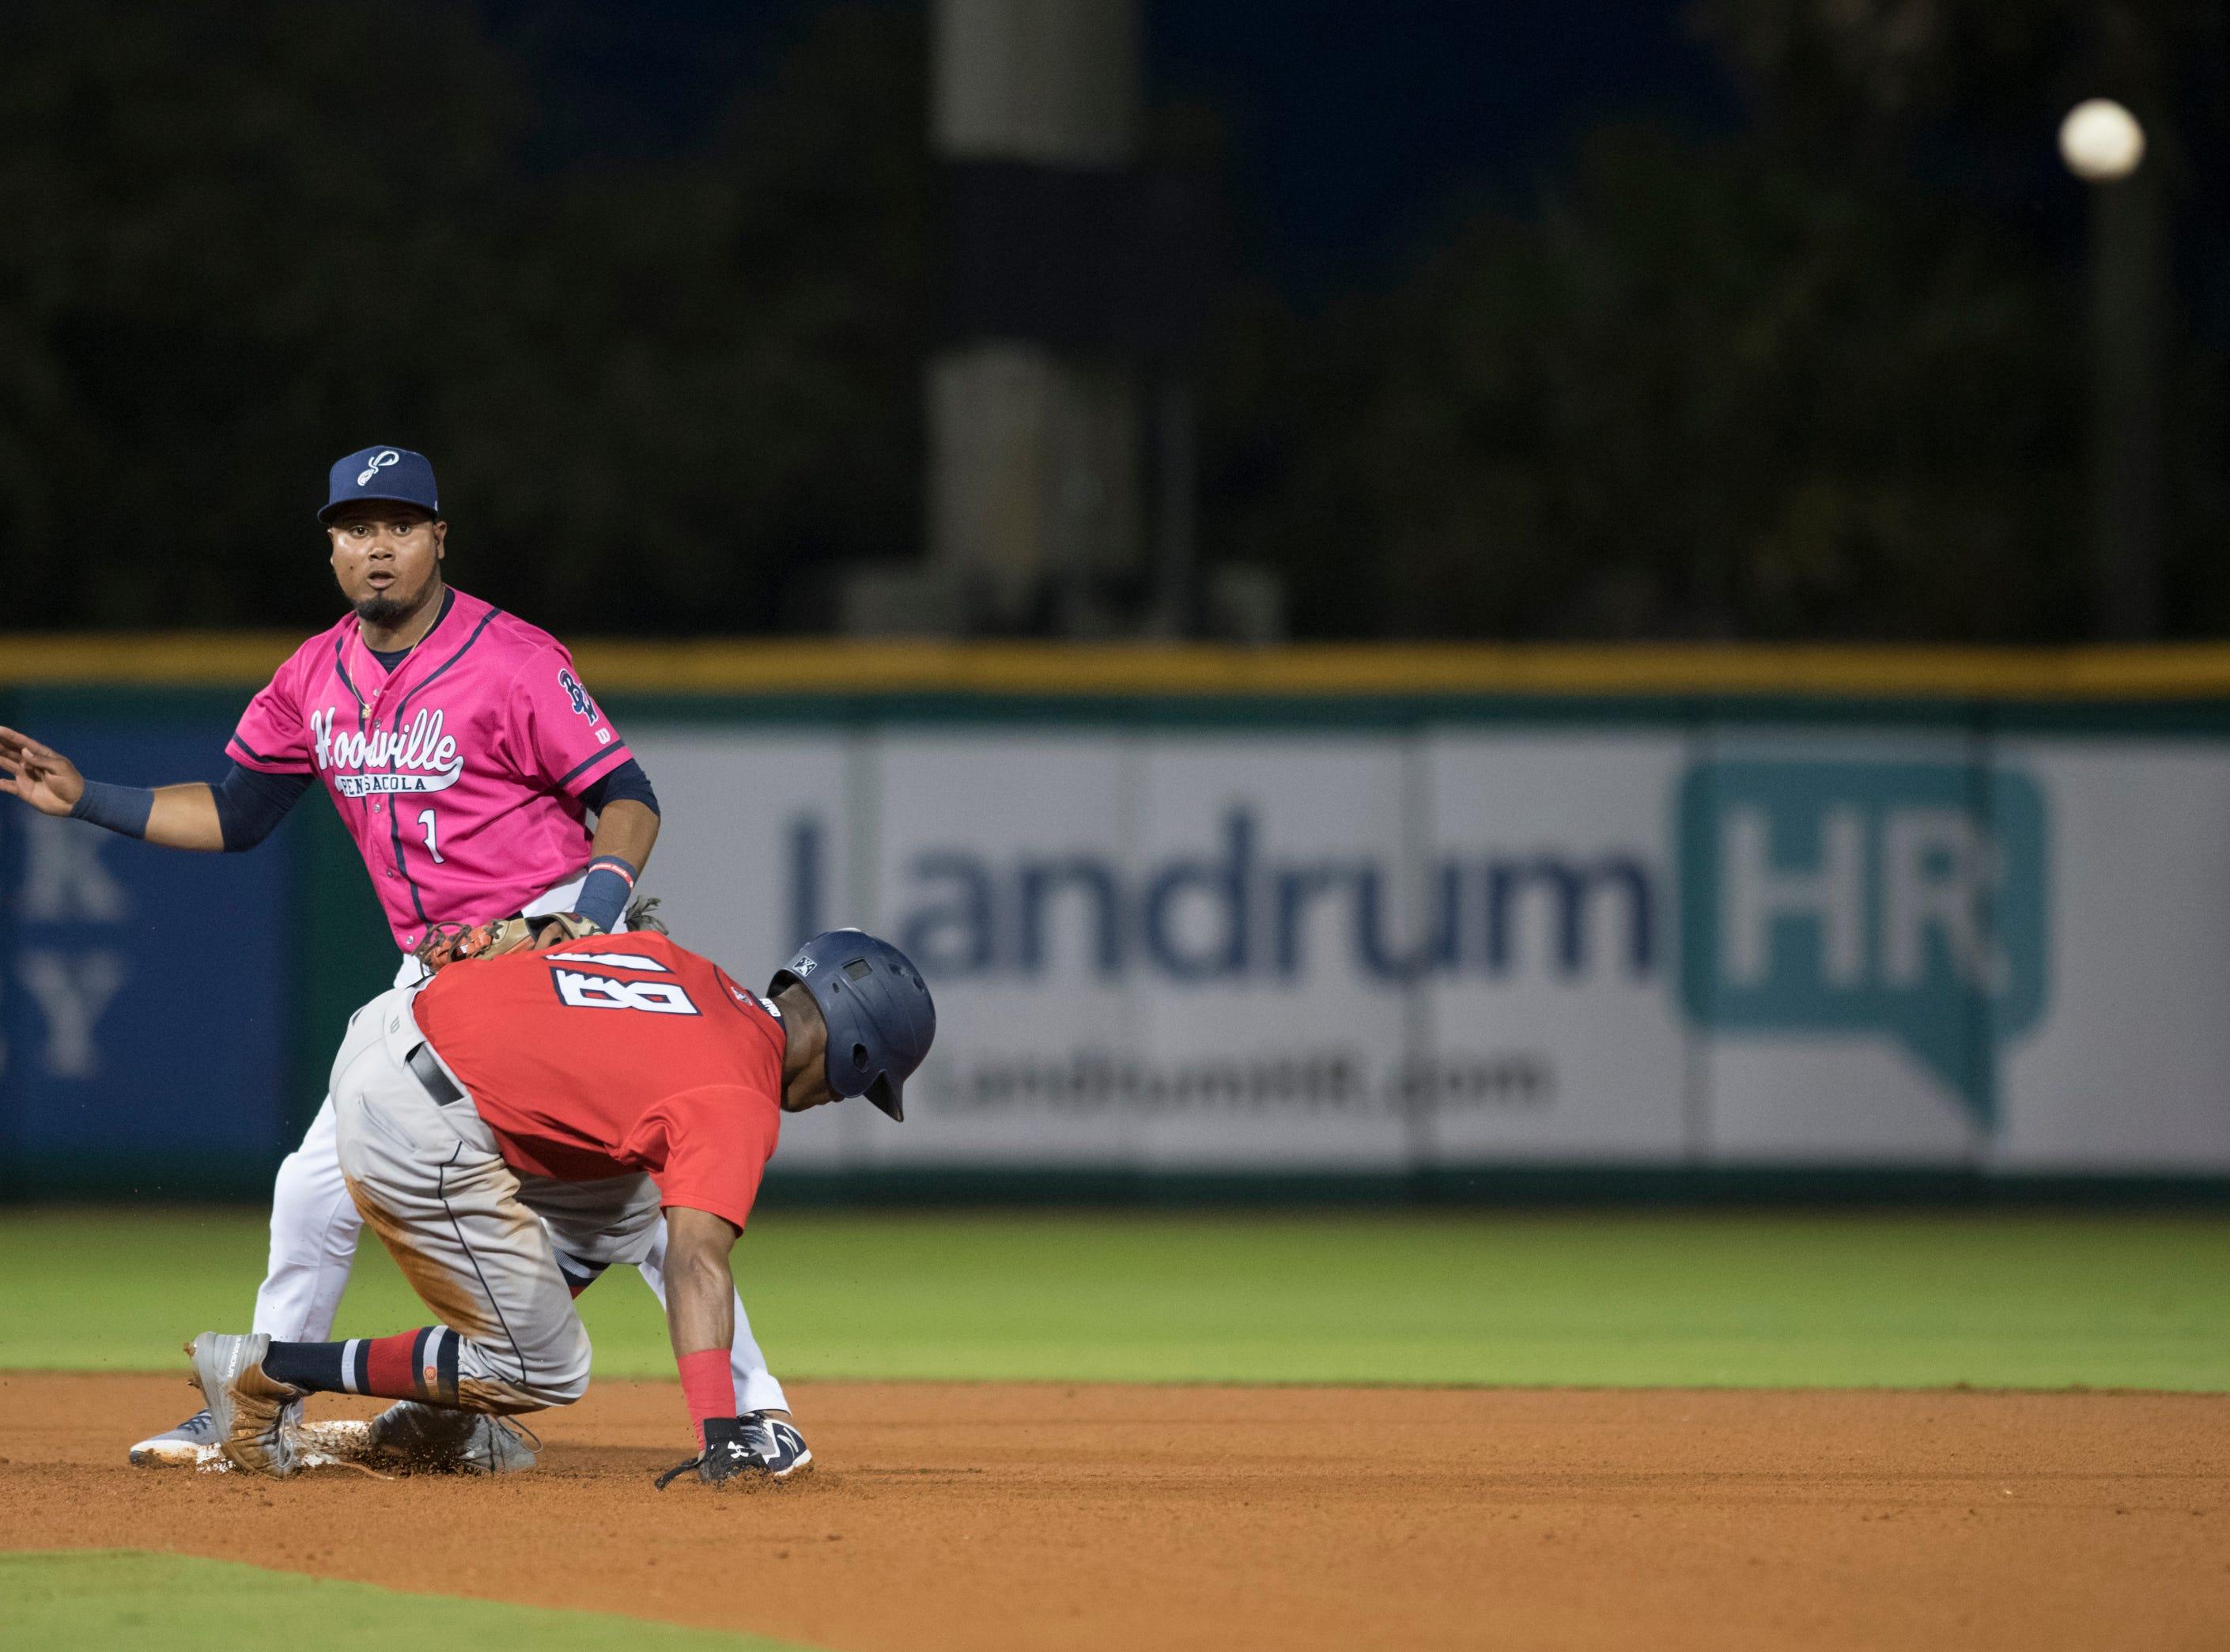 Second baseman Luis Arraez (1) turns the double play during the Jacksonville Jumbo Shrimp vs Pensacola Blue Wahoos baseball game in Pensacola on Friday, April 12, 2019.